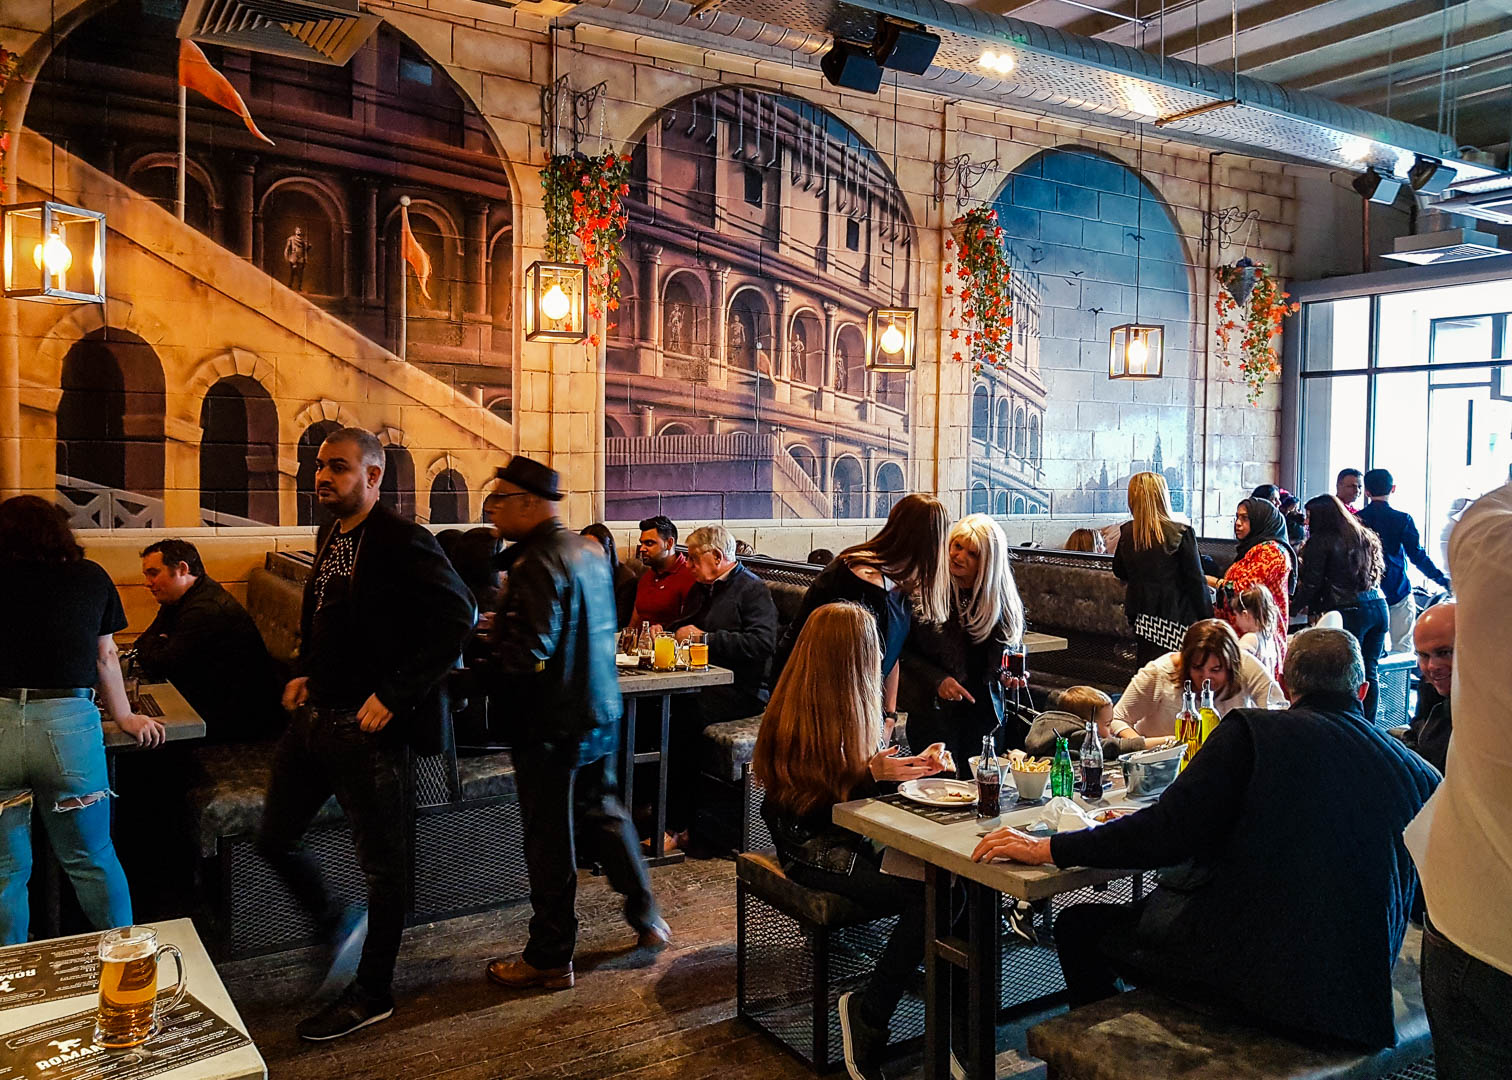 The interior of the new vegan-friendly restaurant Romans Pizzeria Glasgow.